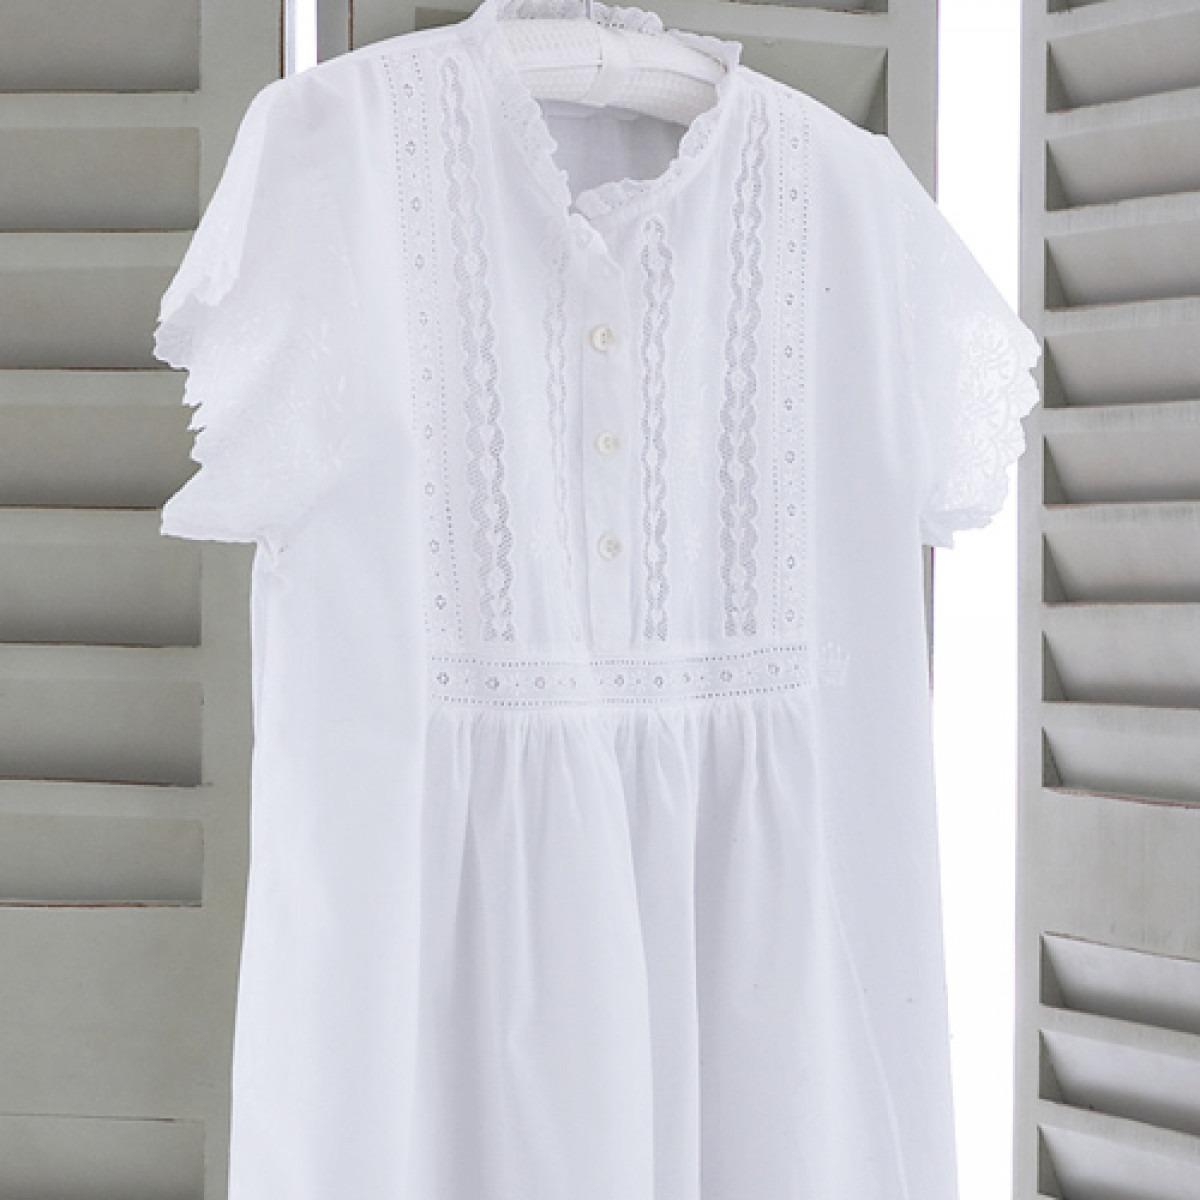 Vanessa nightgown